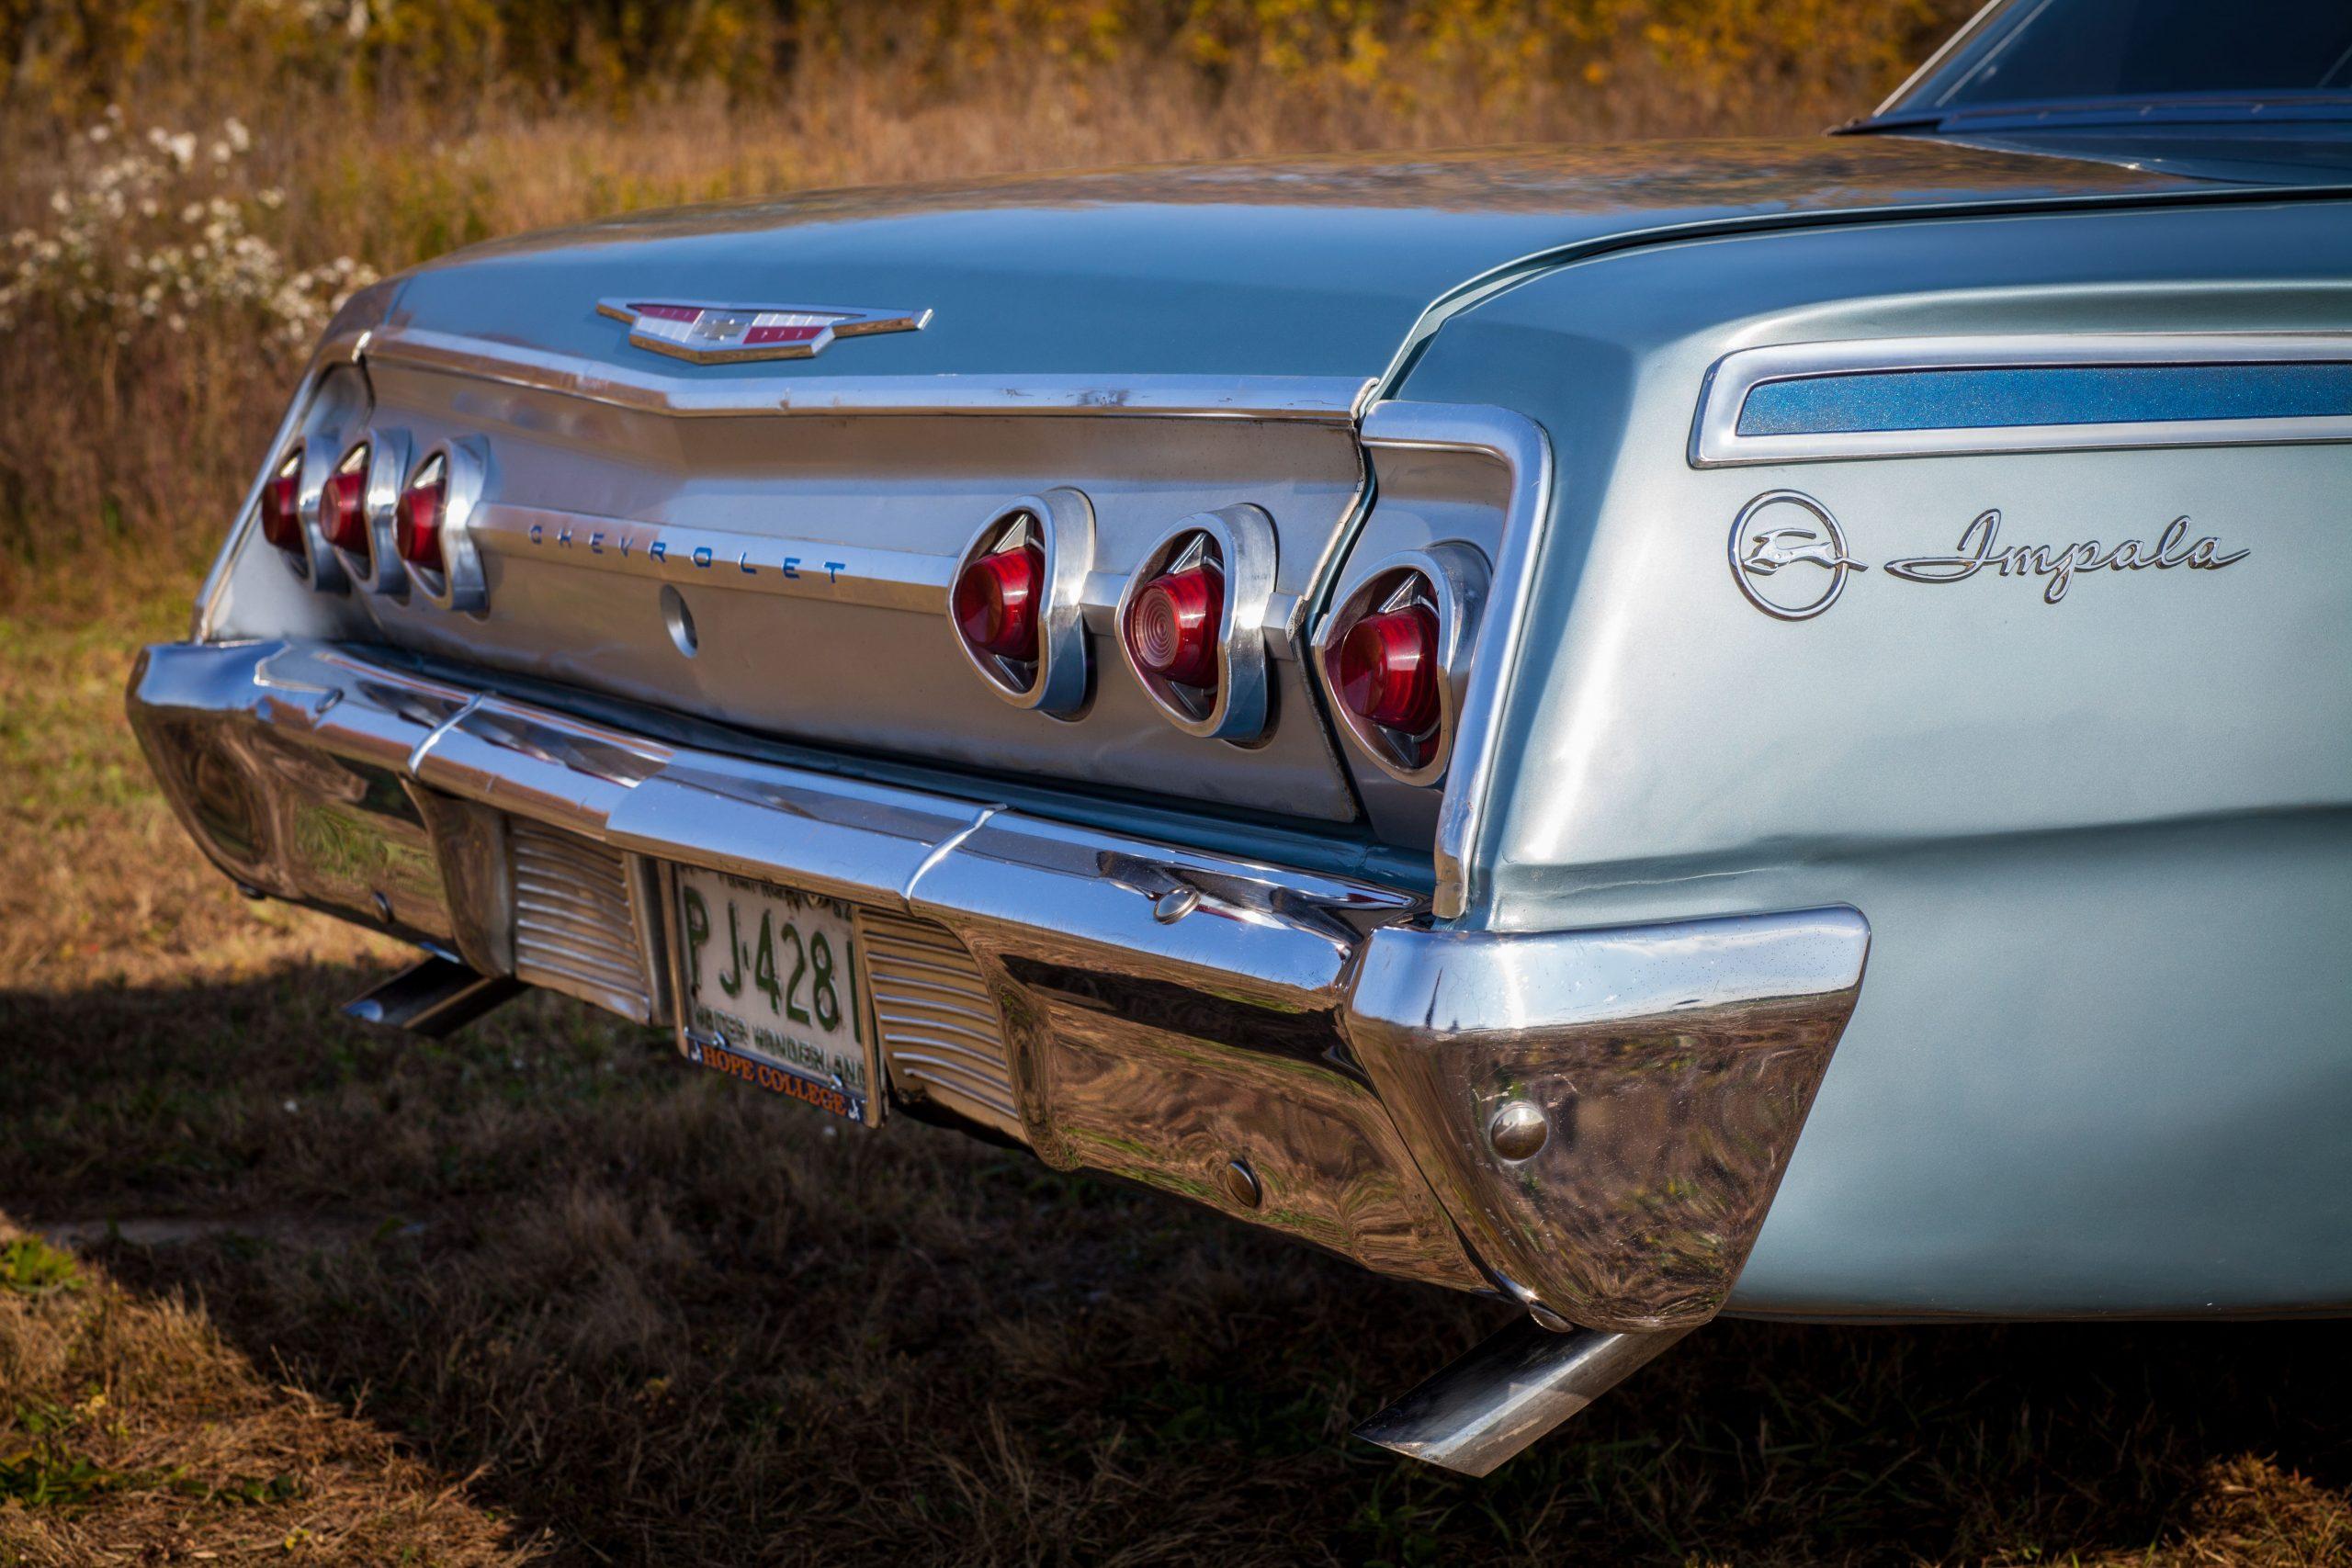 Jason Prince - 1962 Chevrolet Impala - close-up rear